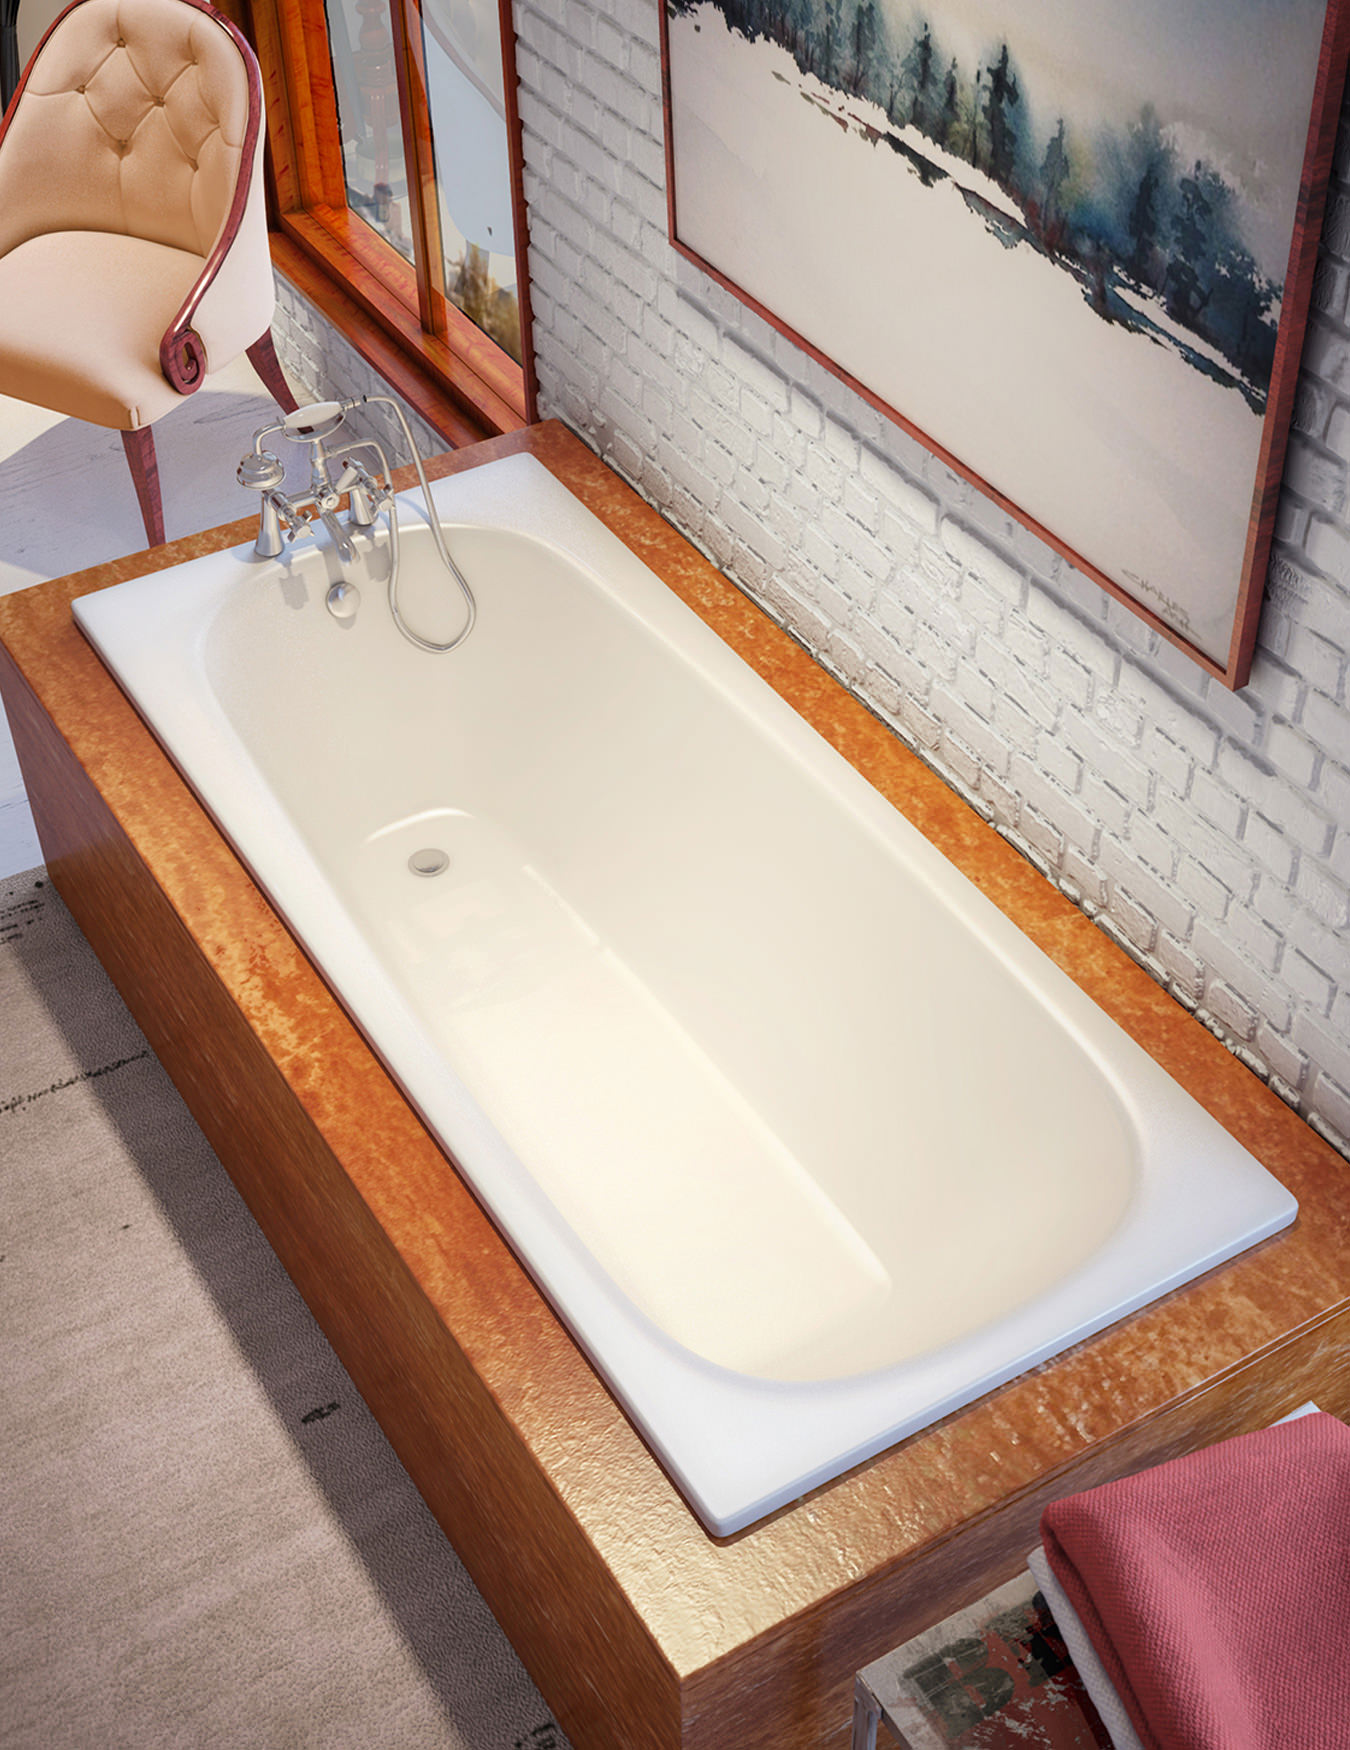 Steel Shower Baths Bette Form Rectangular Super Steel Bath 1700 X 750mm